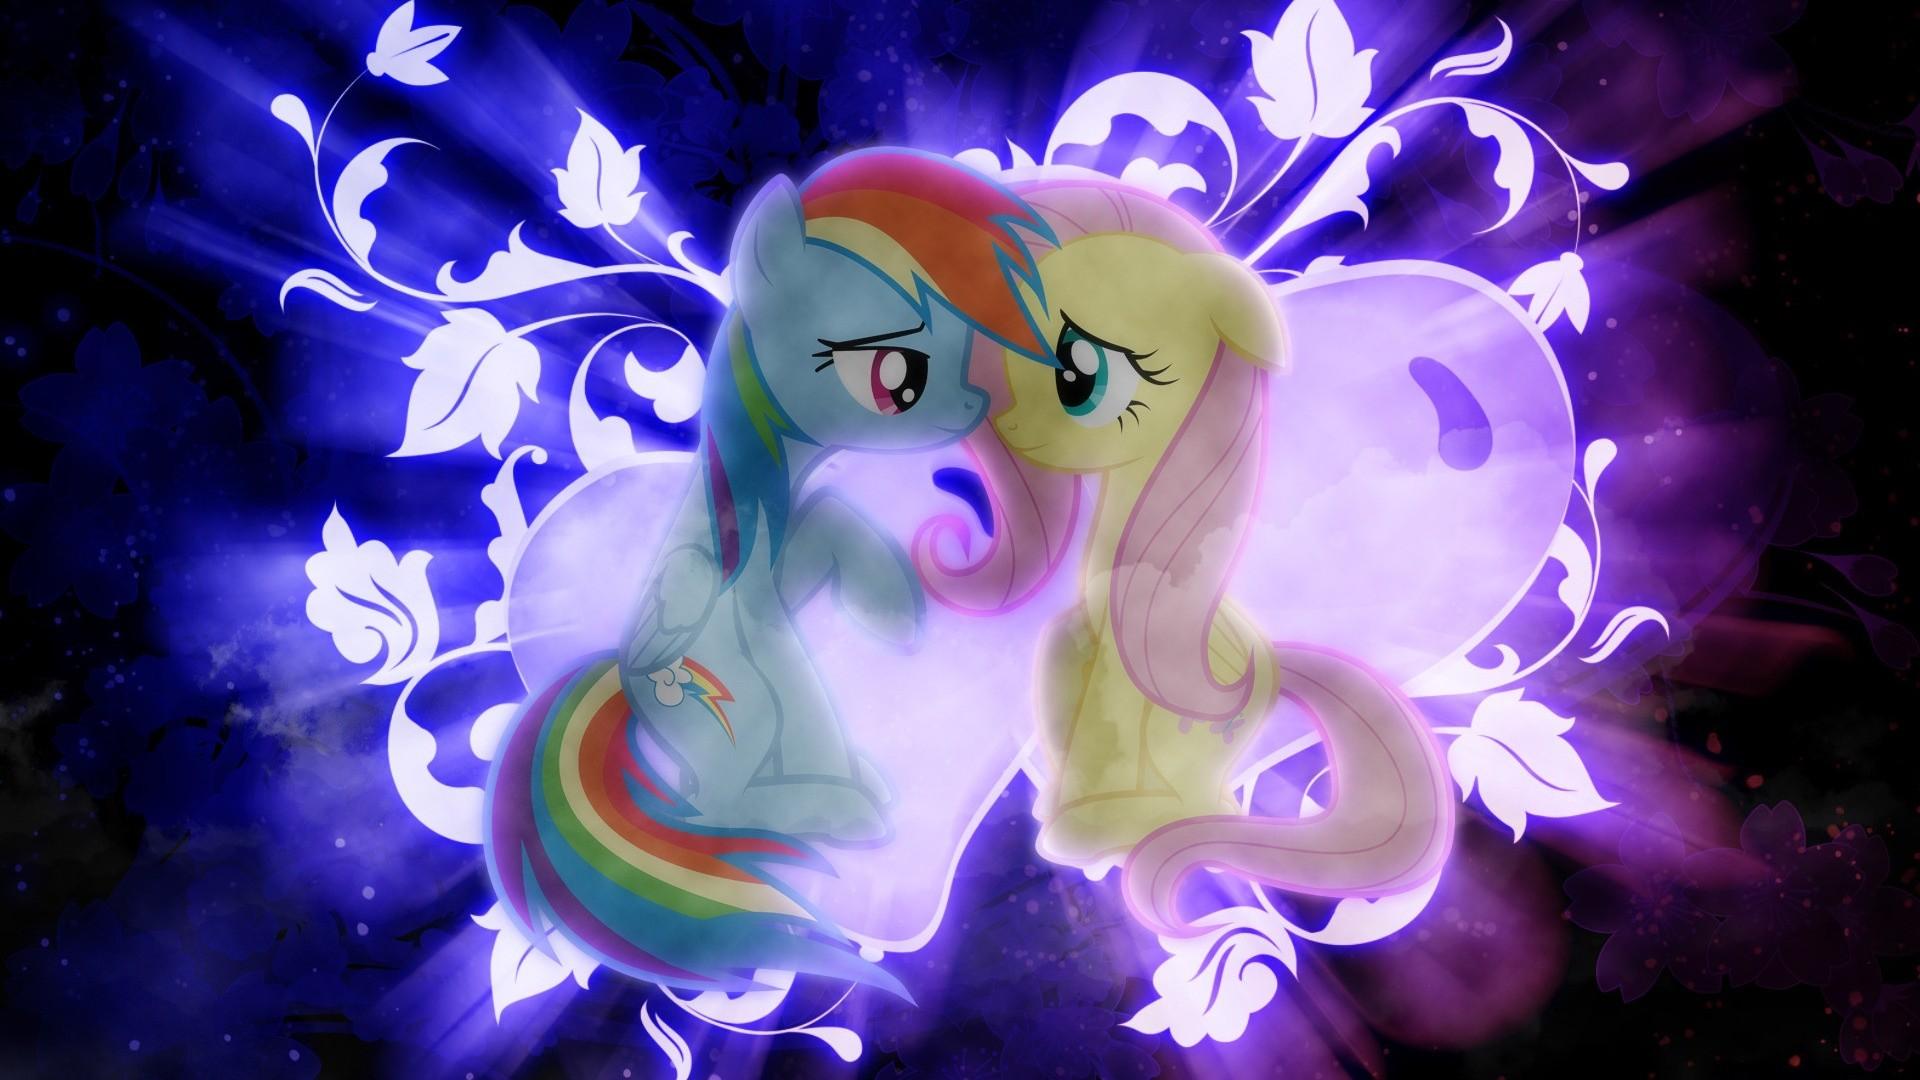 Rainbow Dash and Fluttershy shipping wallpaper.jpg